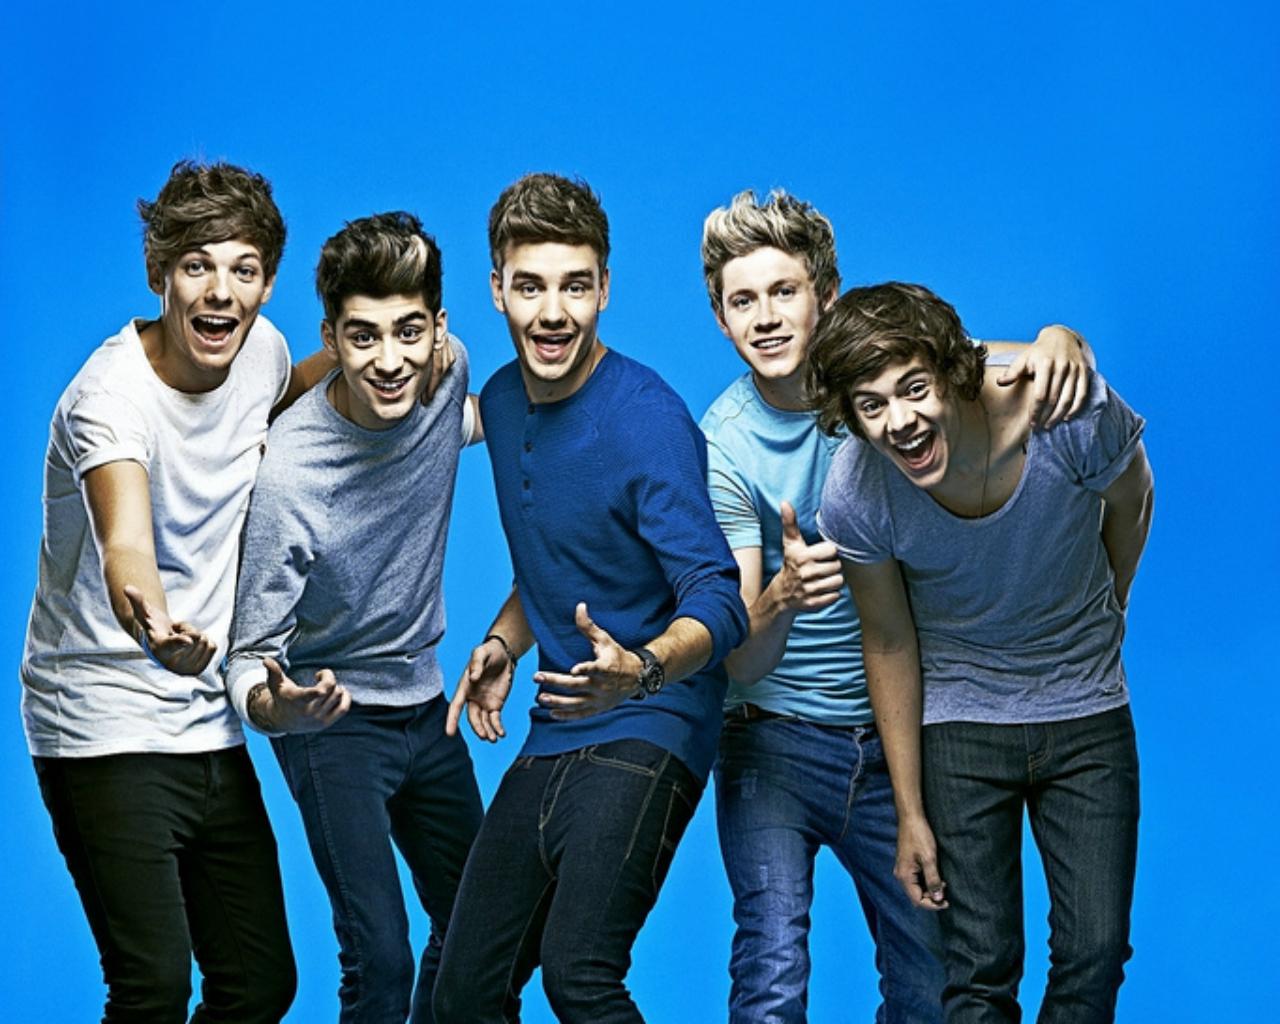 One Direction Wallpaper Photos Image 21503 Wallpaper WallpapersTube 1280x1024